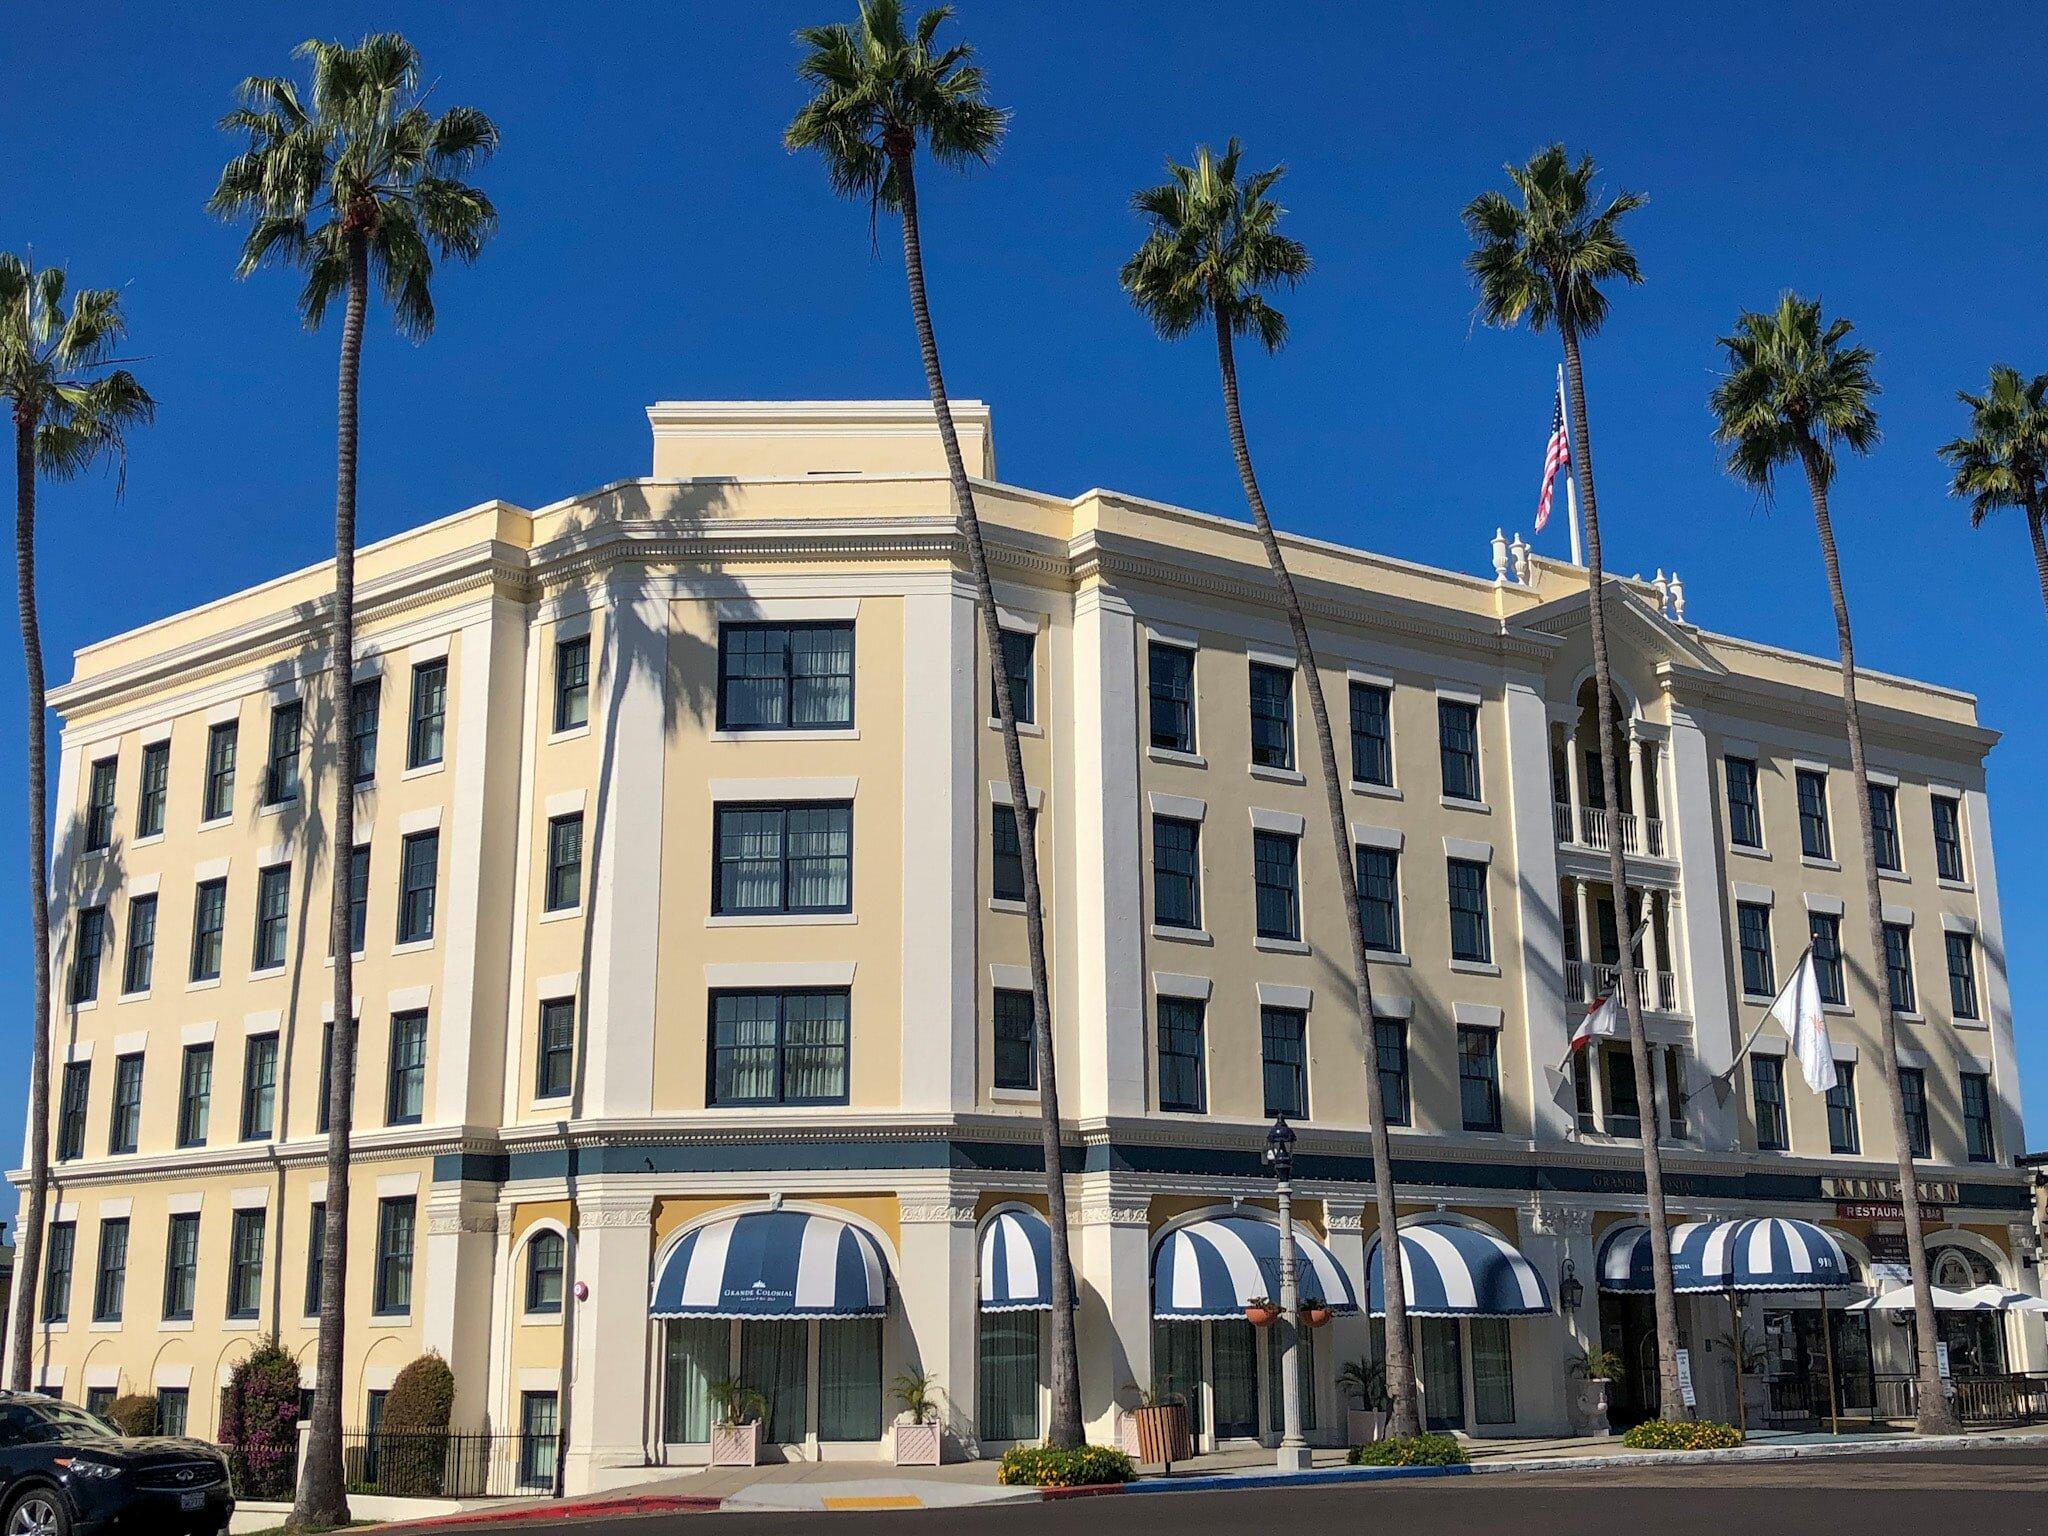 The best hotel in La Jolla for foodies: Grande Colonial La Jolla Hotel